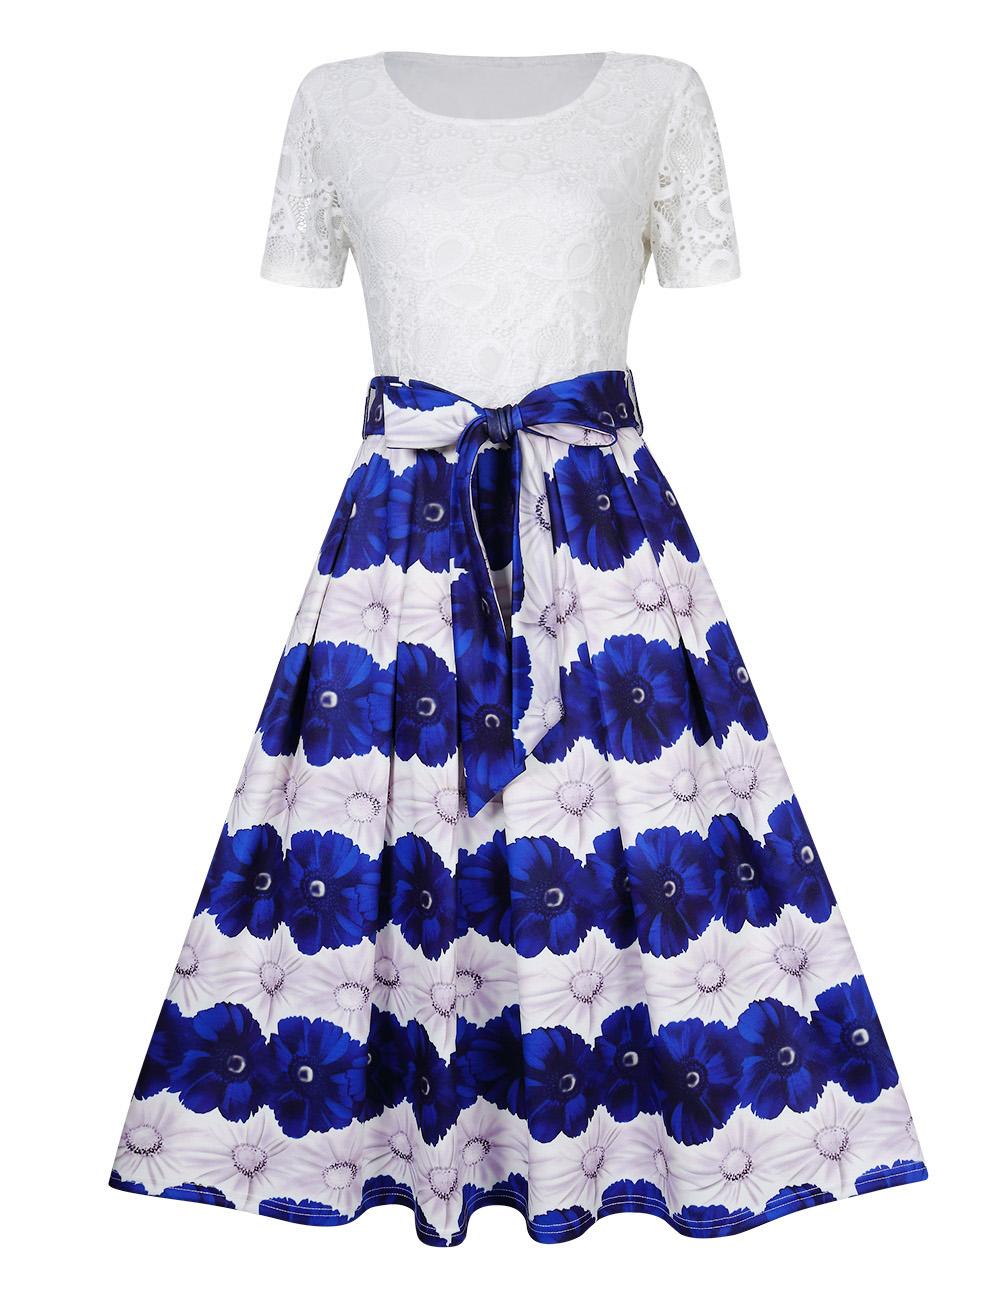 GlorySunshine Women Floral Lace Short Sleeve Modest Swing Dress